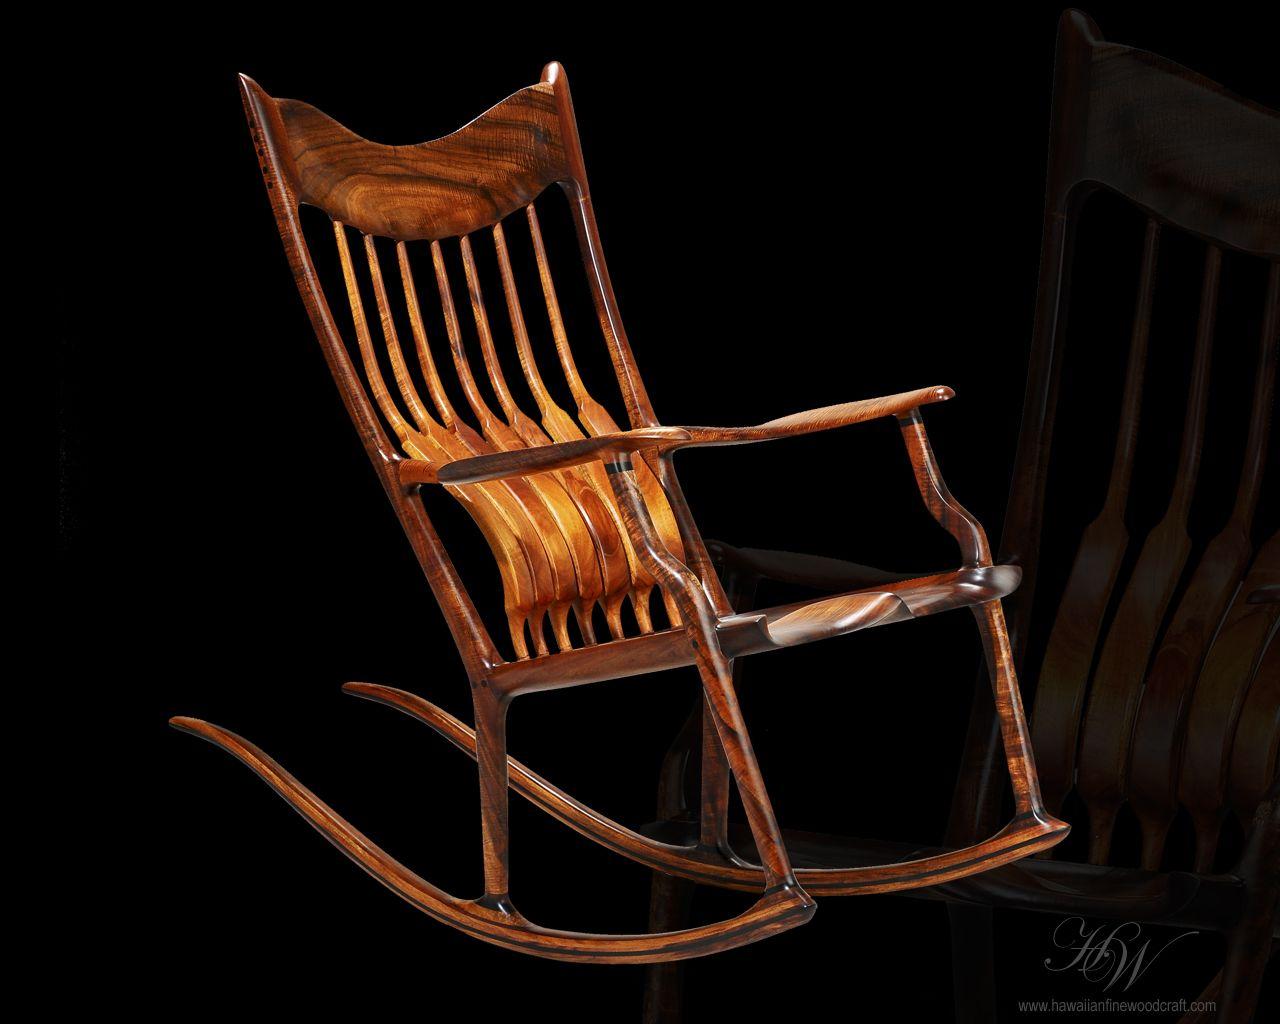 Stupendous Hawaiian Fine Woodcraft Koa Rocker Hand Made Rocking Machost Co Dining Chair Design Ideas Machostcouk